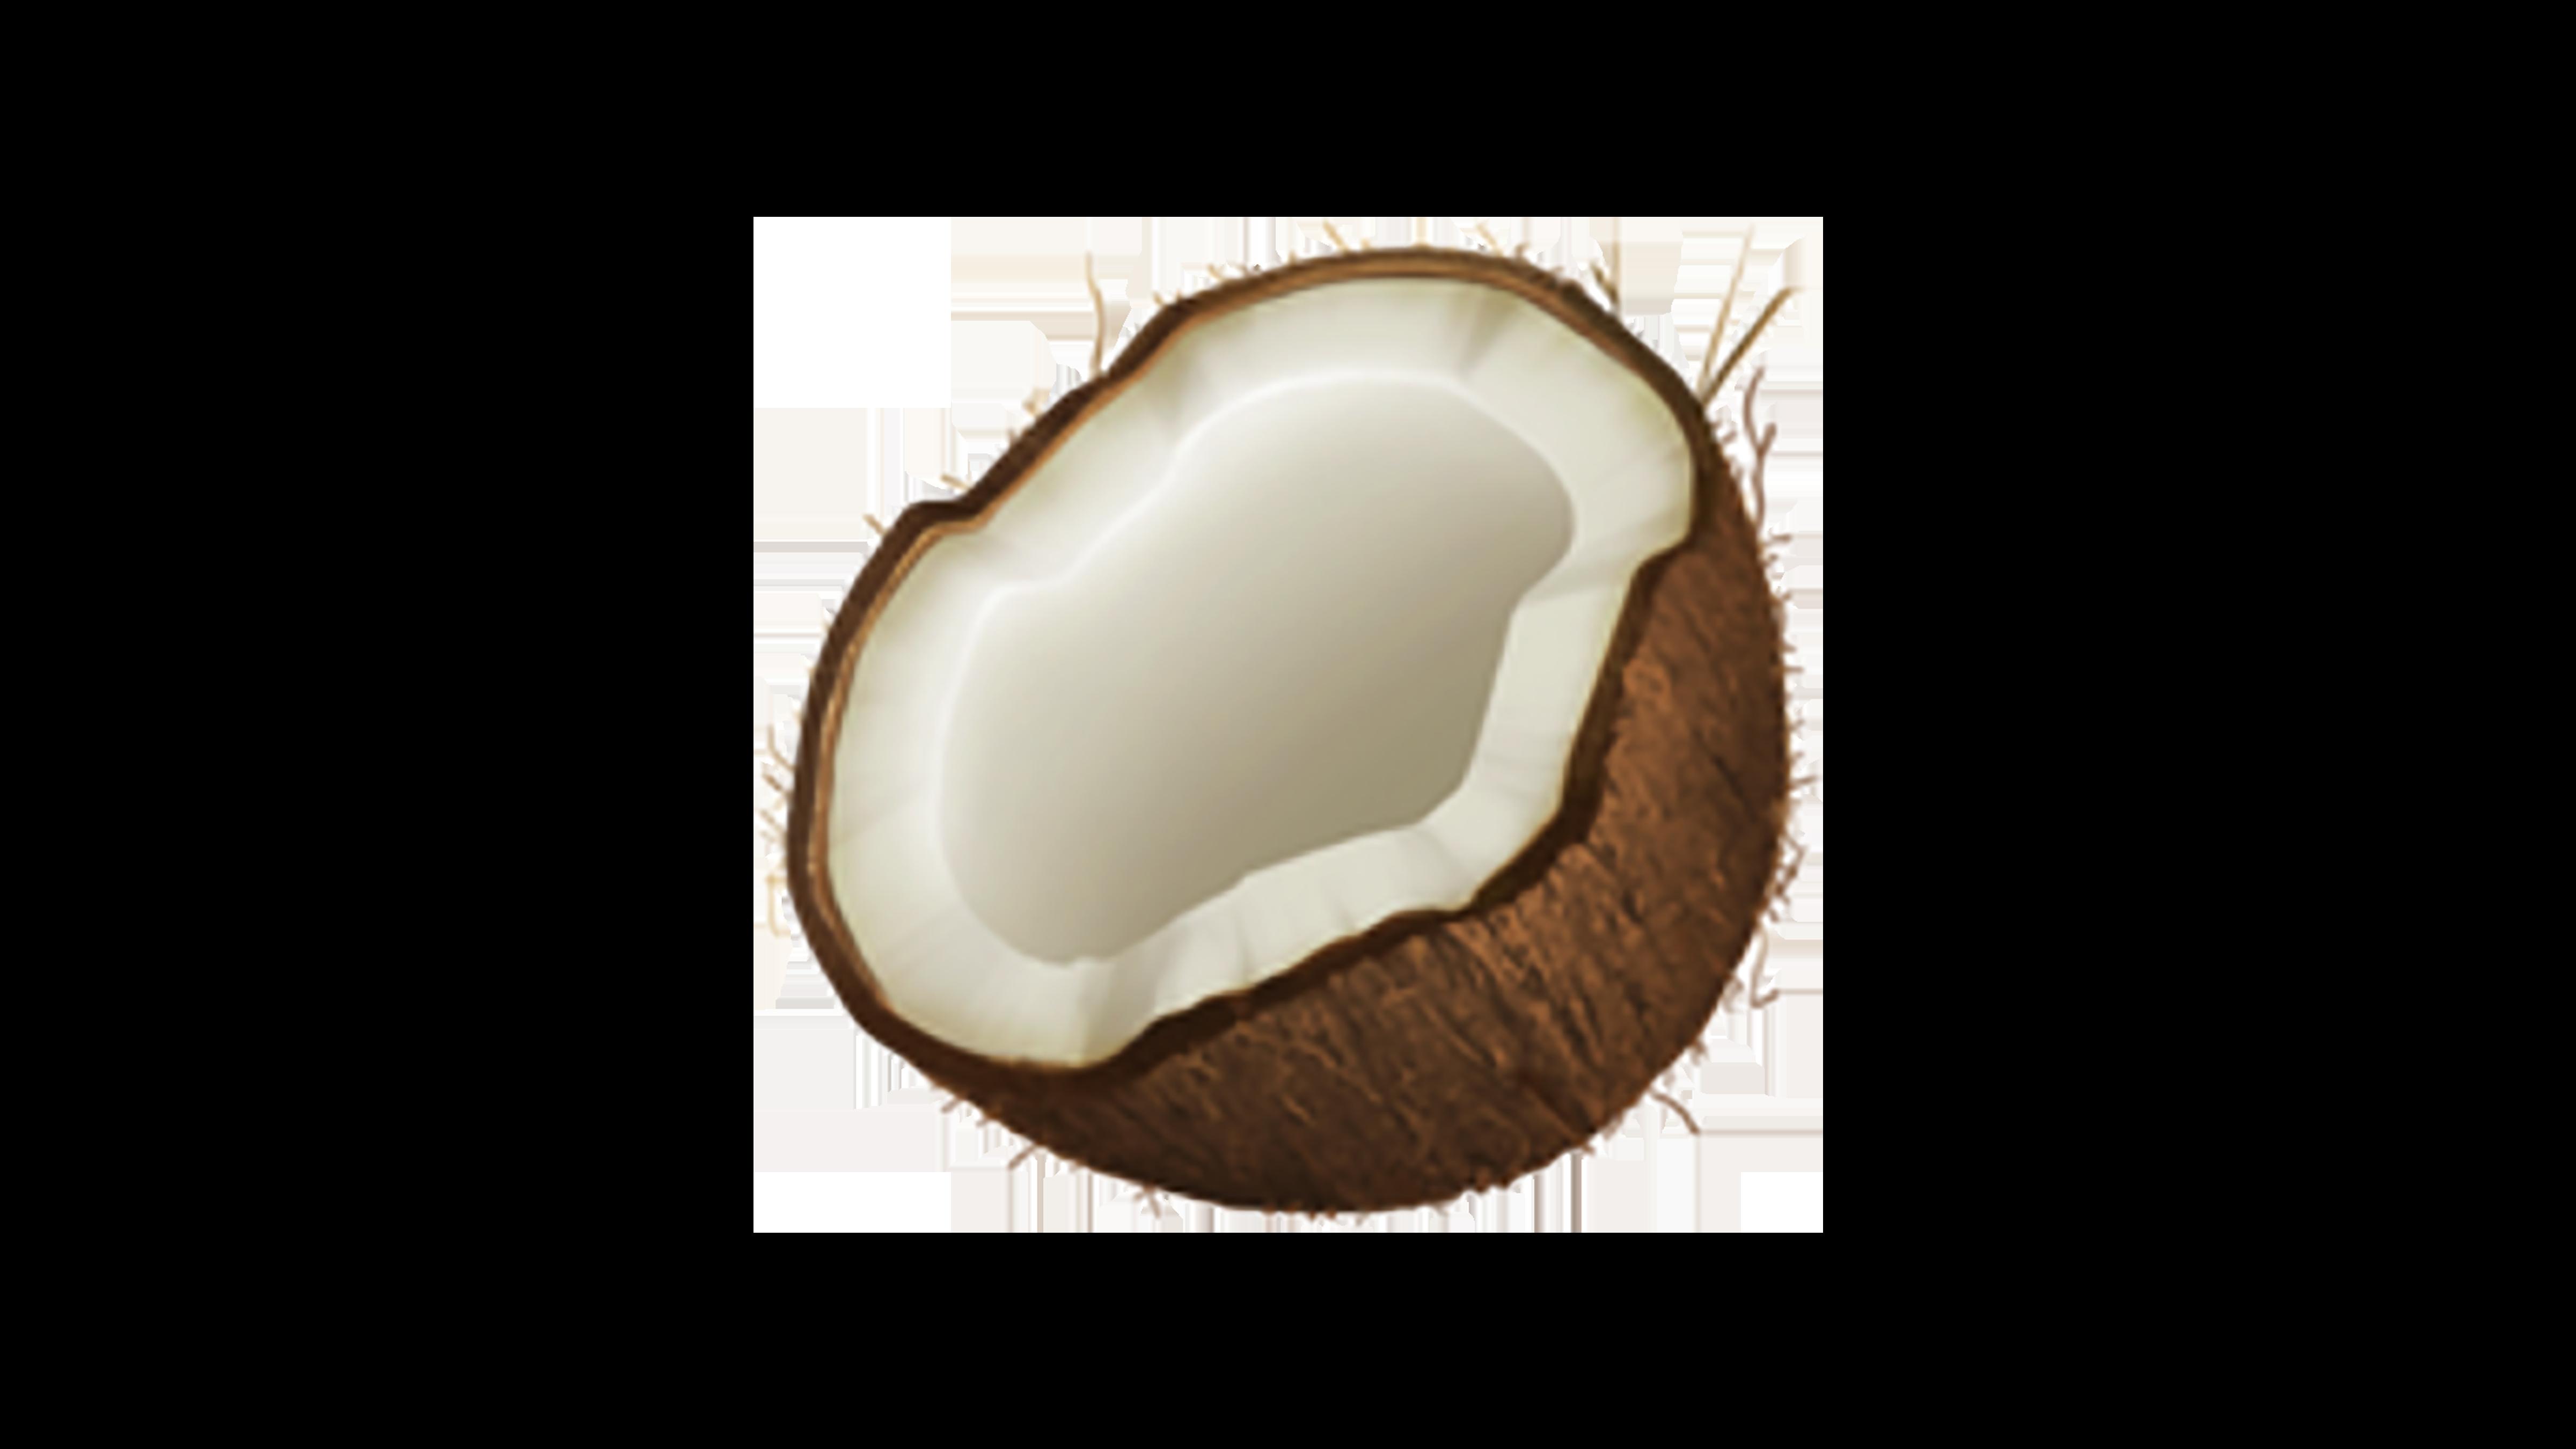 Coconut emoji